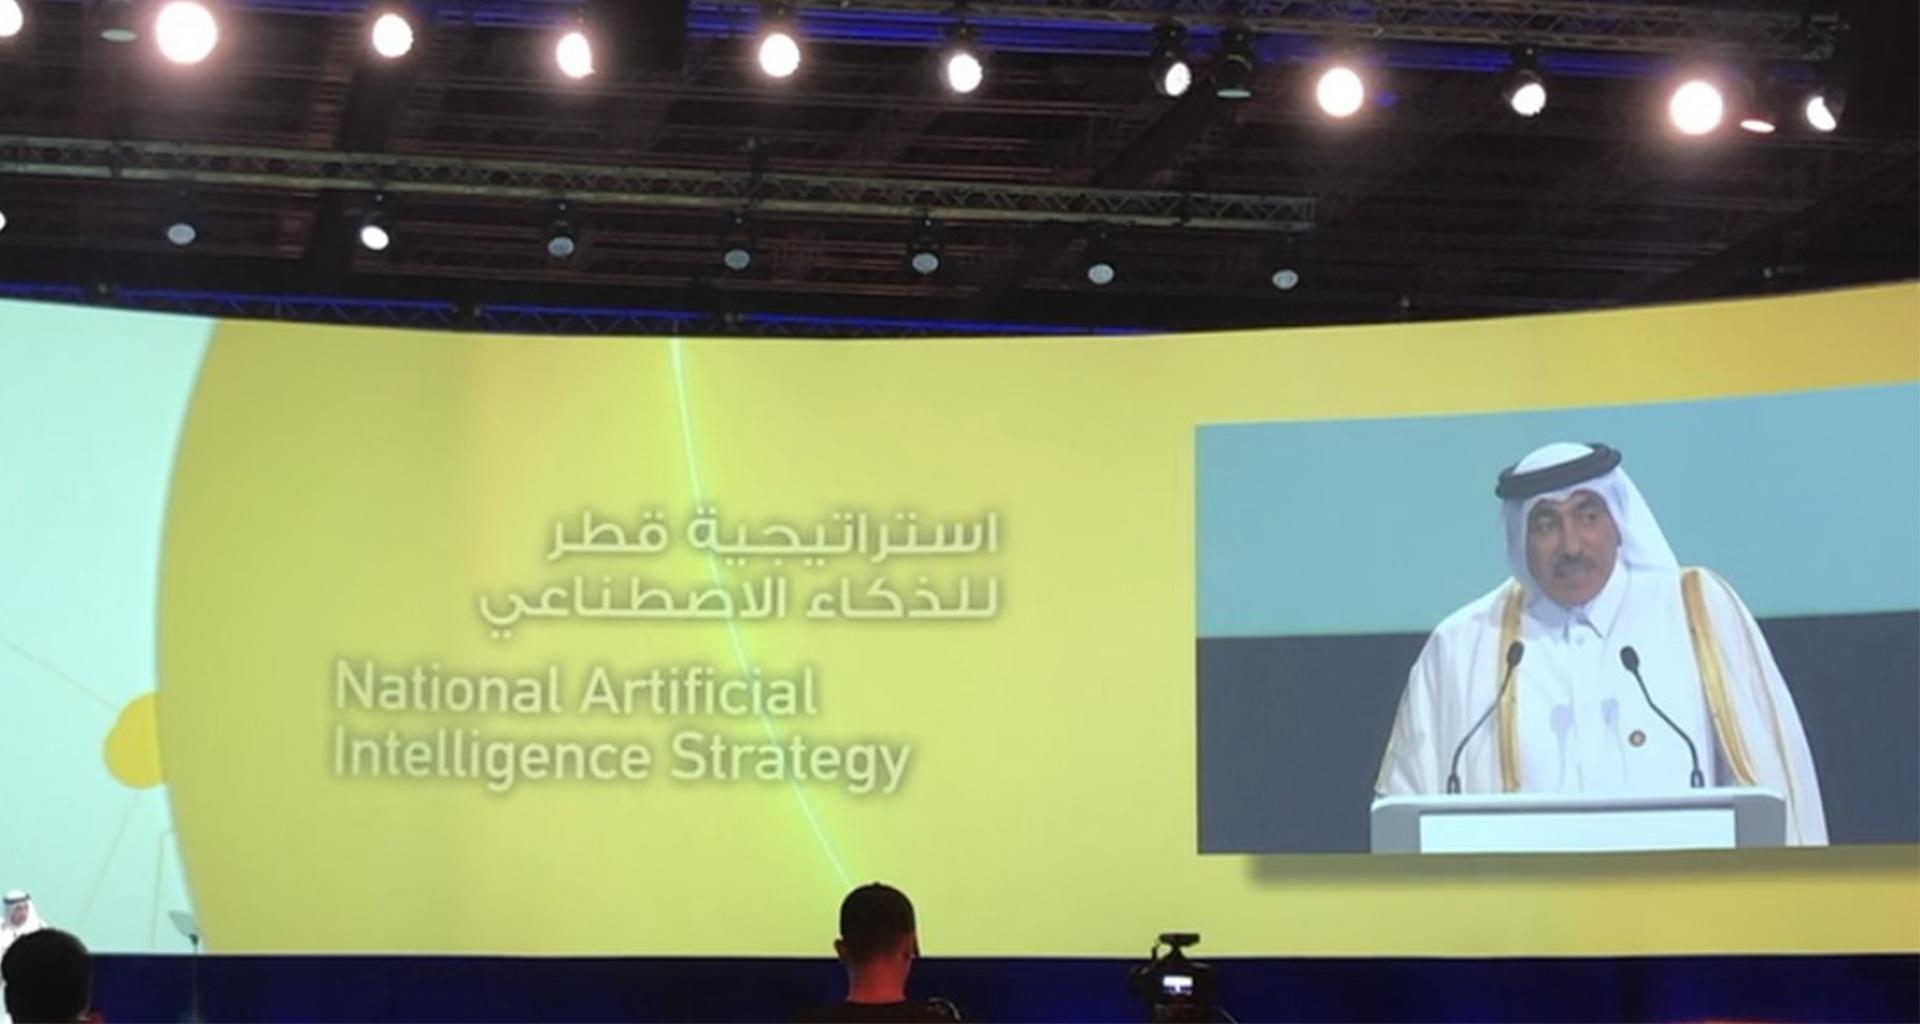 MOTC Announces Qatar's National Artificial Intelligence Strategy Developed by HBKU's QCRI